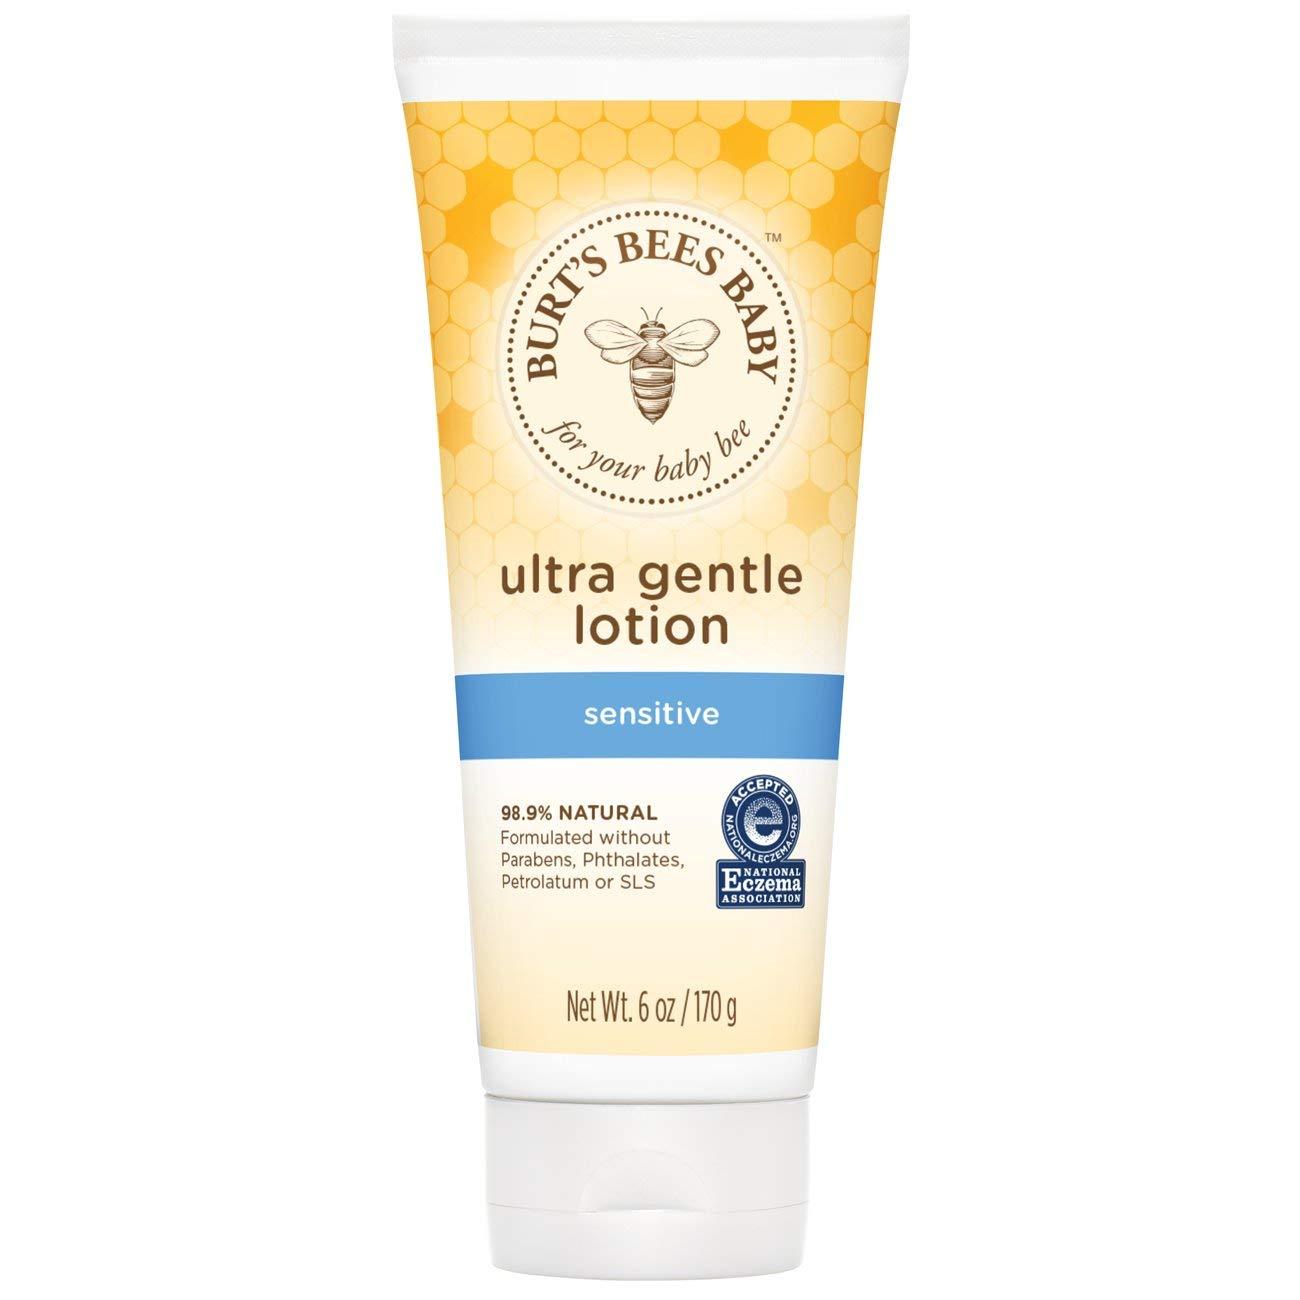 Burt's Bees Baby Ultra Gentle Lotion for Sensitive Skin - 6 oz